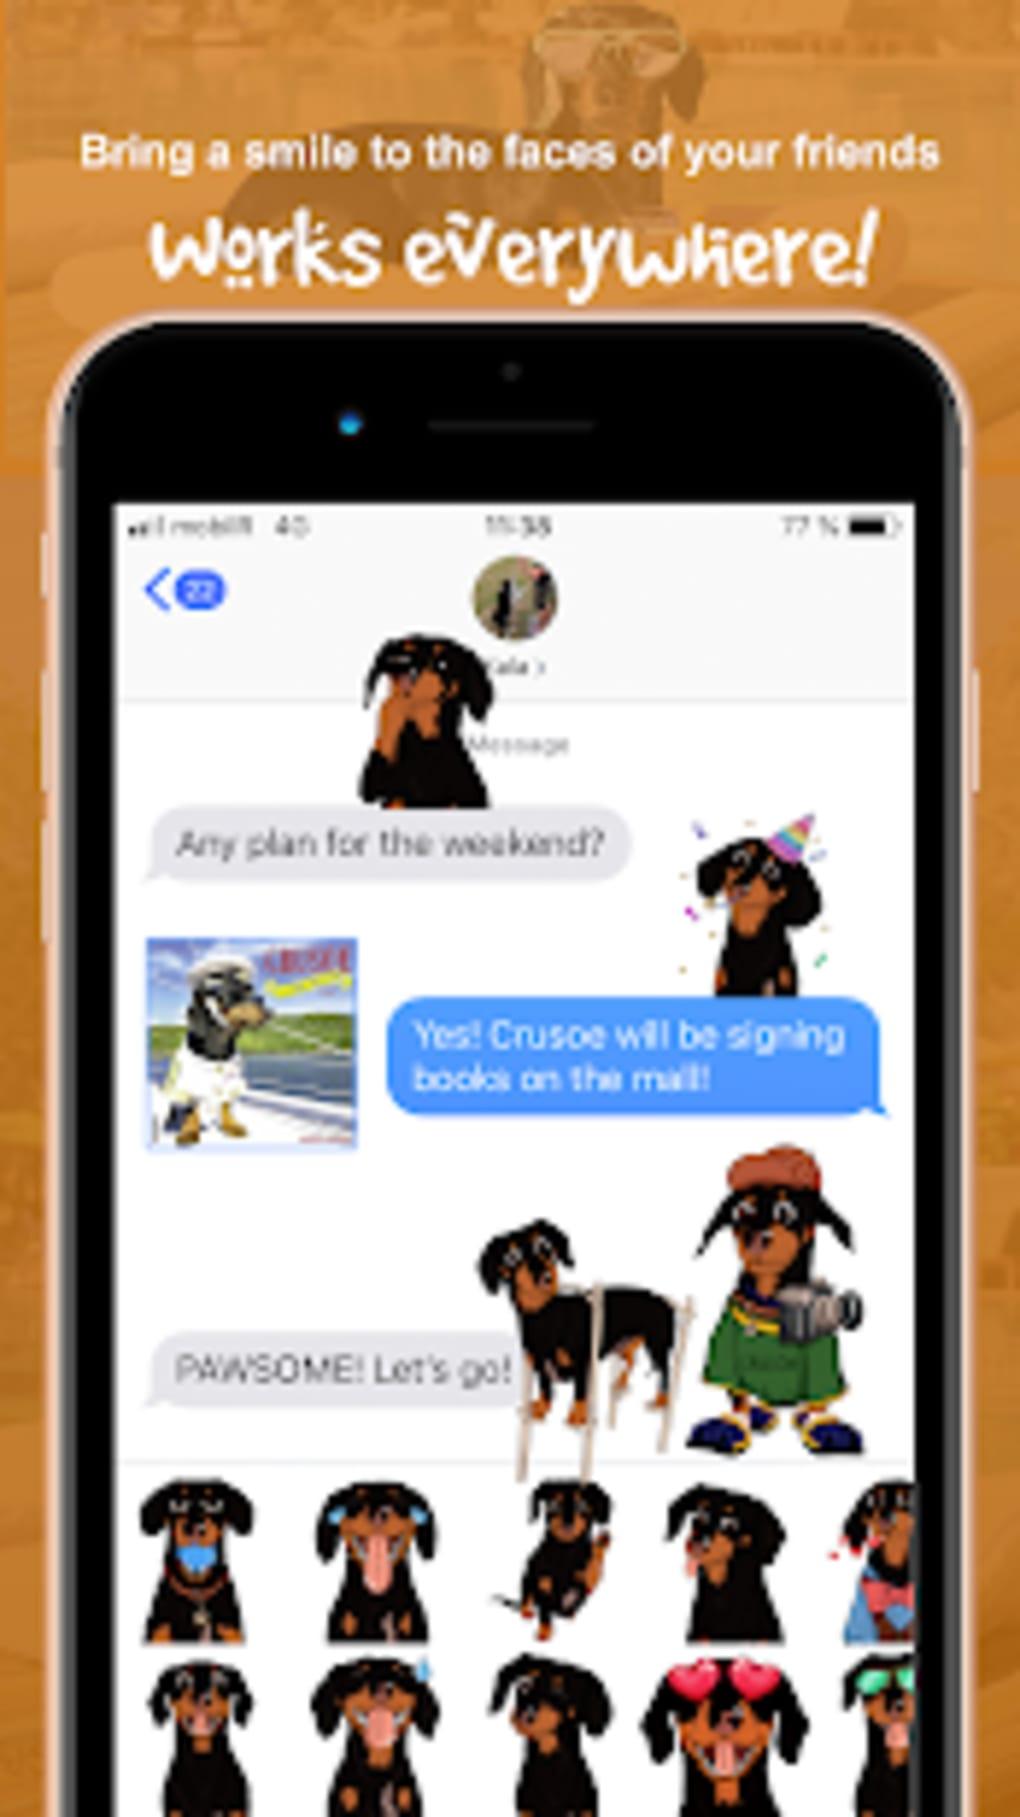 CrusoeMoji - Celebrity Dachshund Wiener Dog Emojis for Android